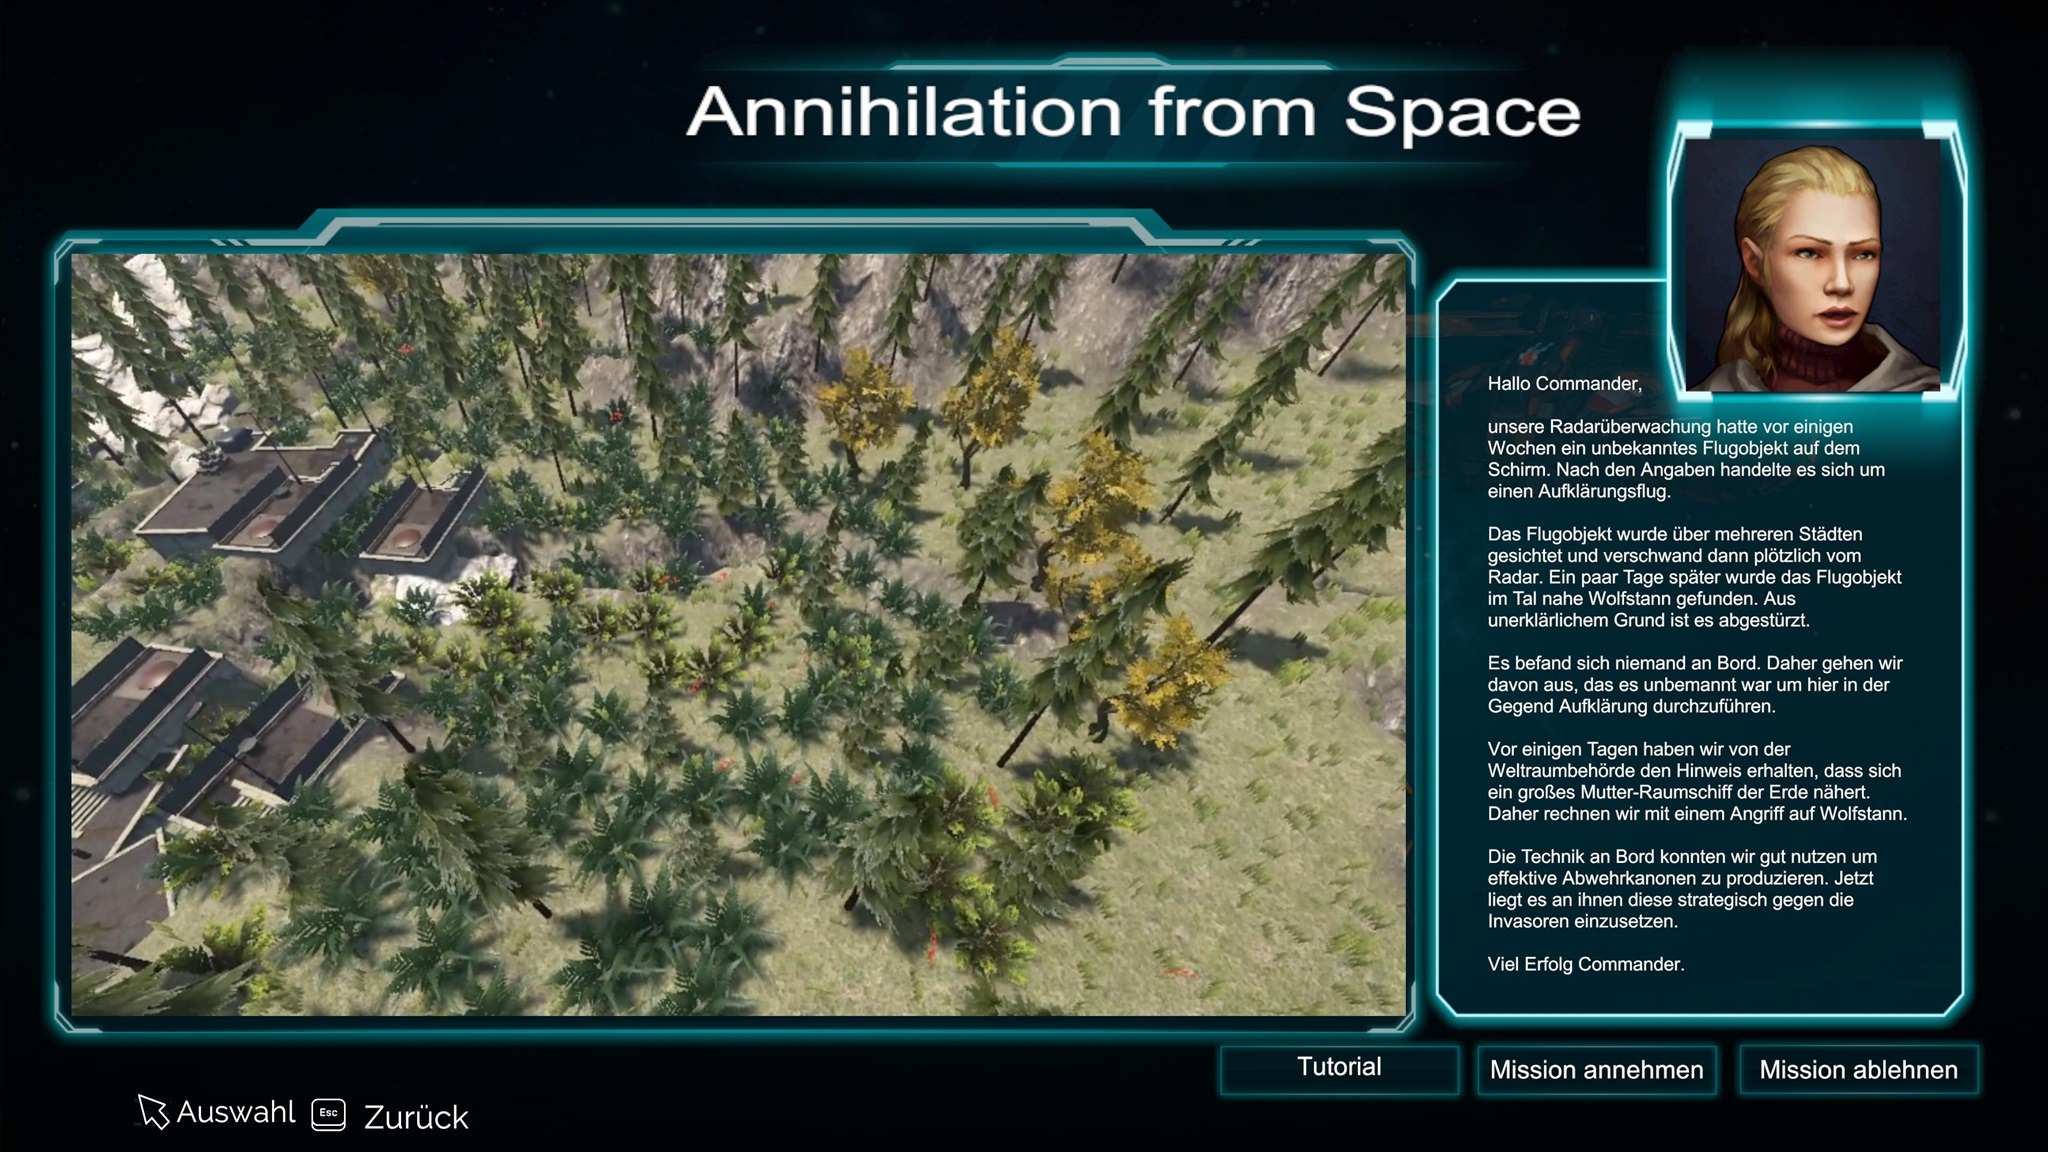 tower-defense-scifi-2021-02-04-16-44-12-85-large.jpg